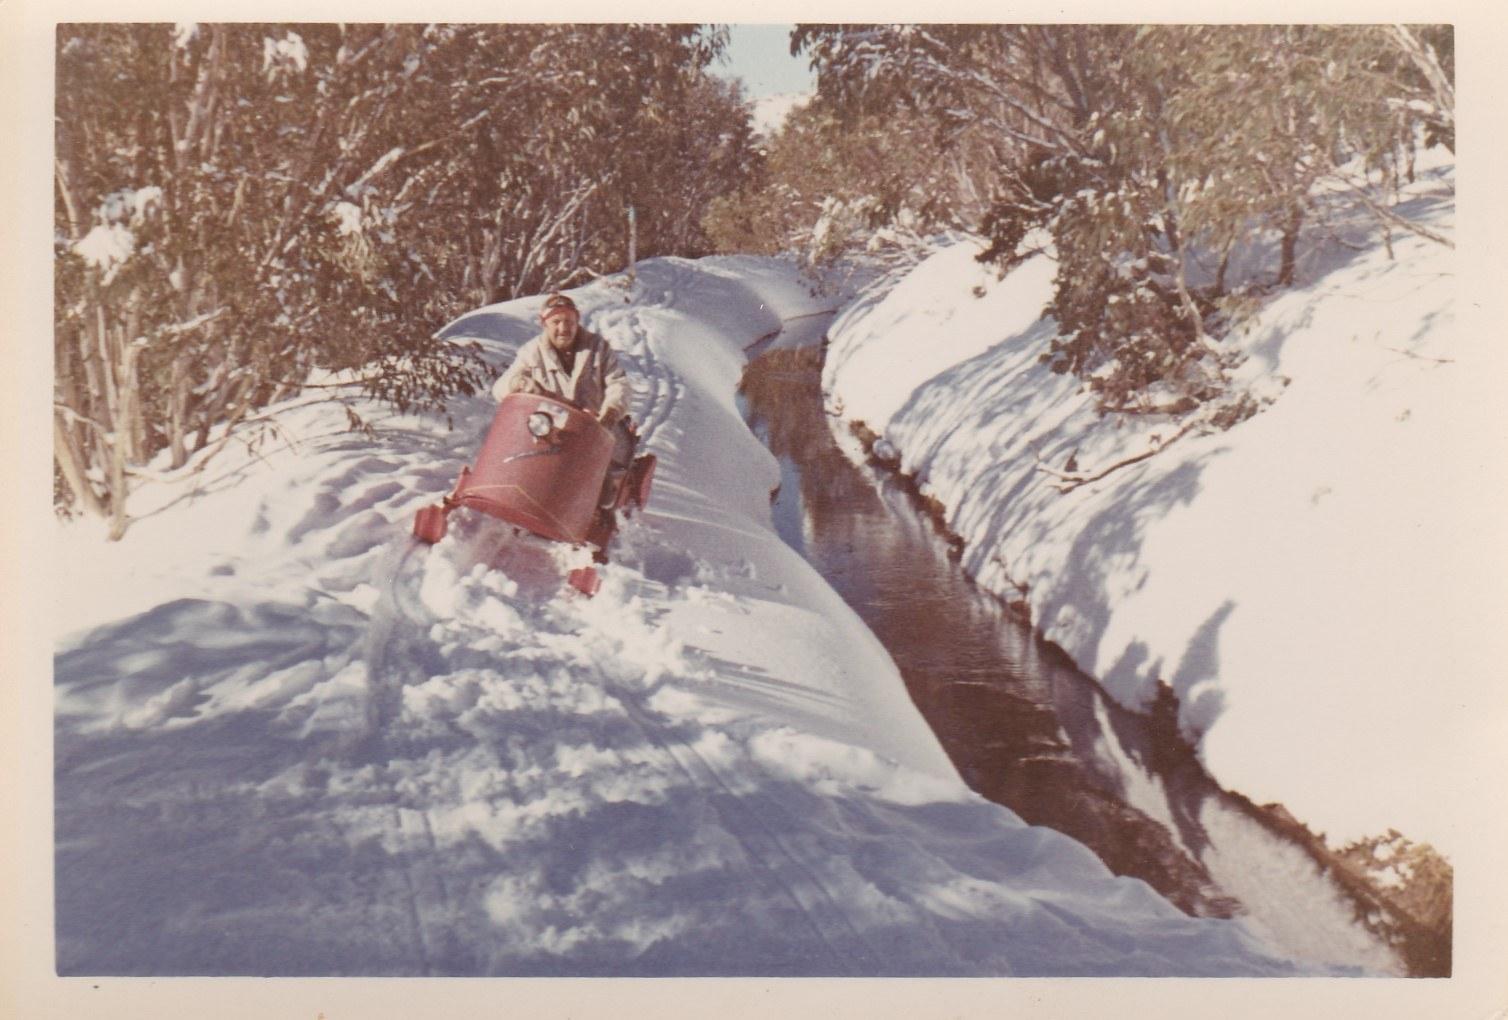 Dad on the Raceline riding his beloved Polaris.jpg